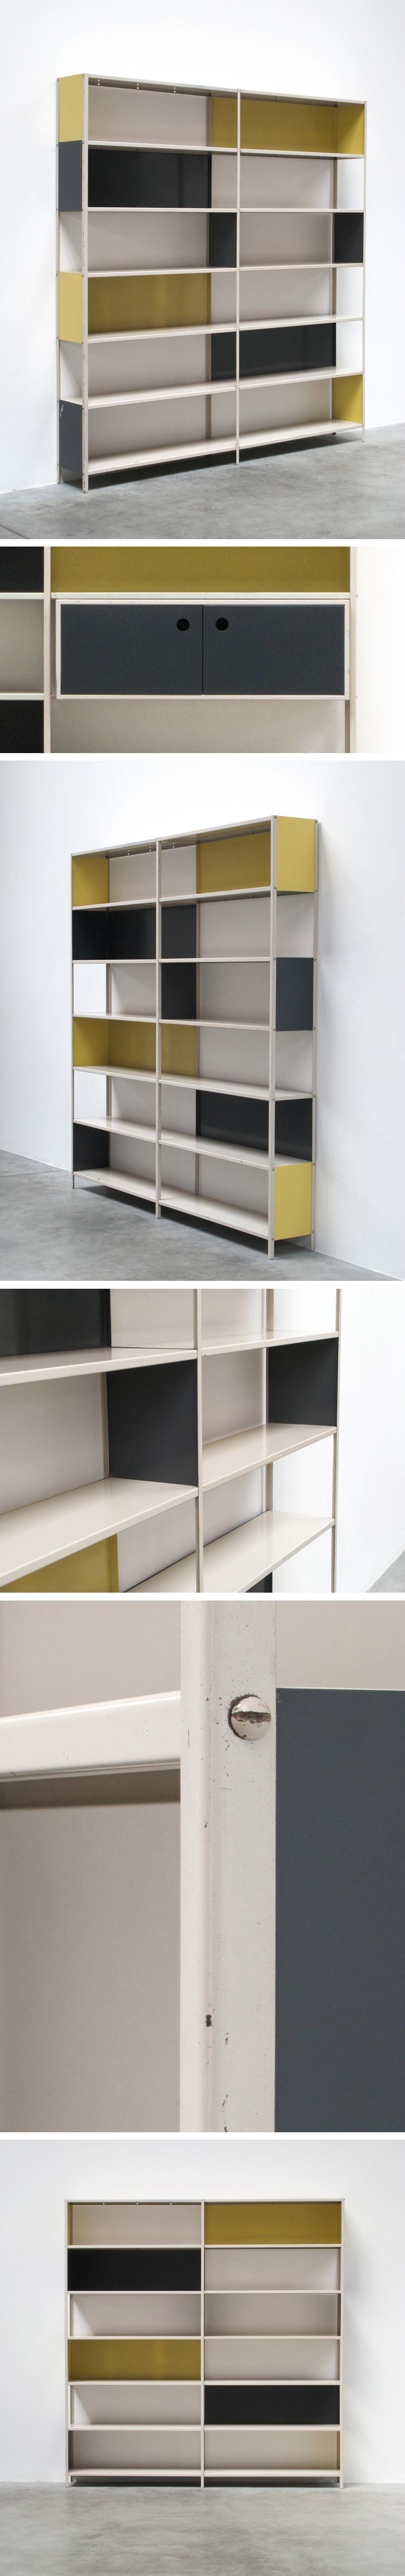 Friso Kramer Asmeta modular shelving wall unit 1953 Large